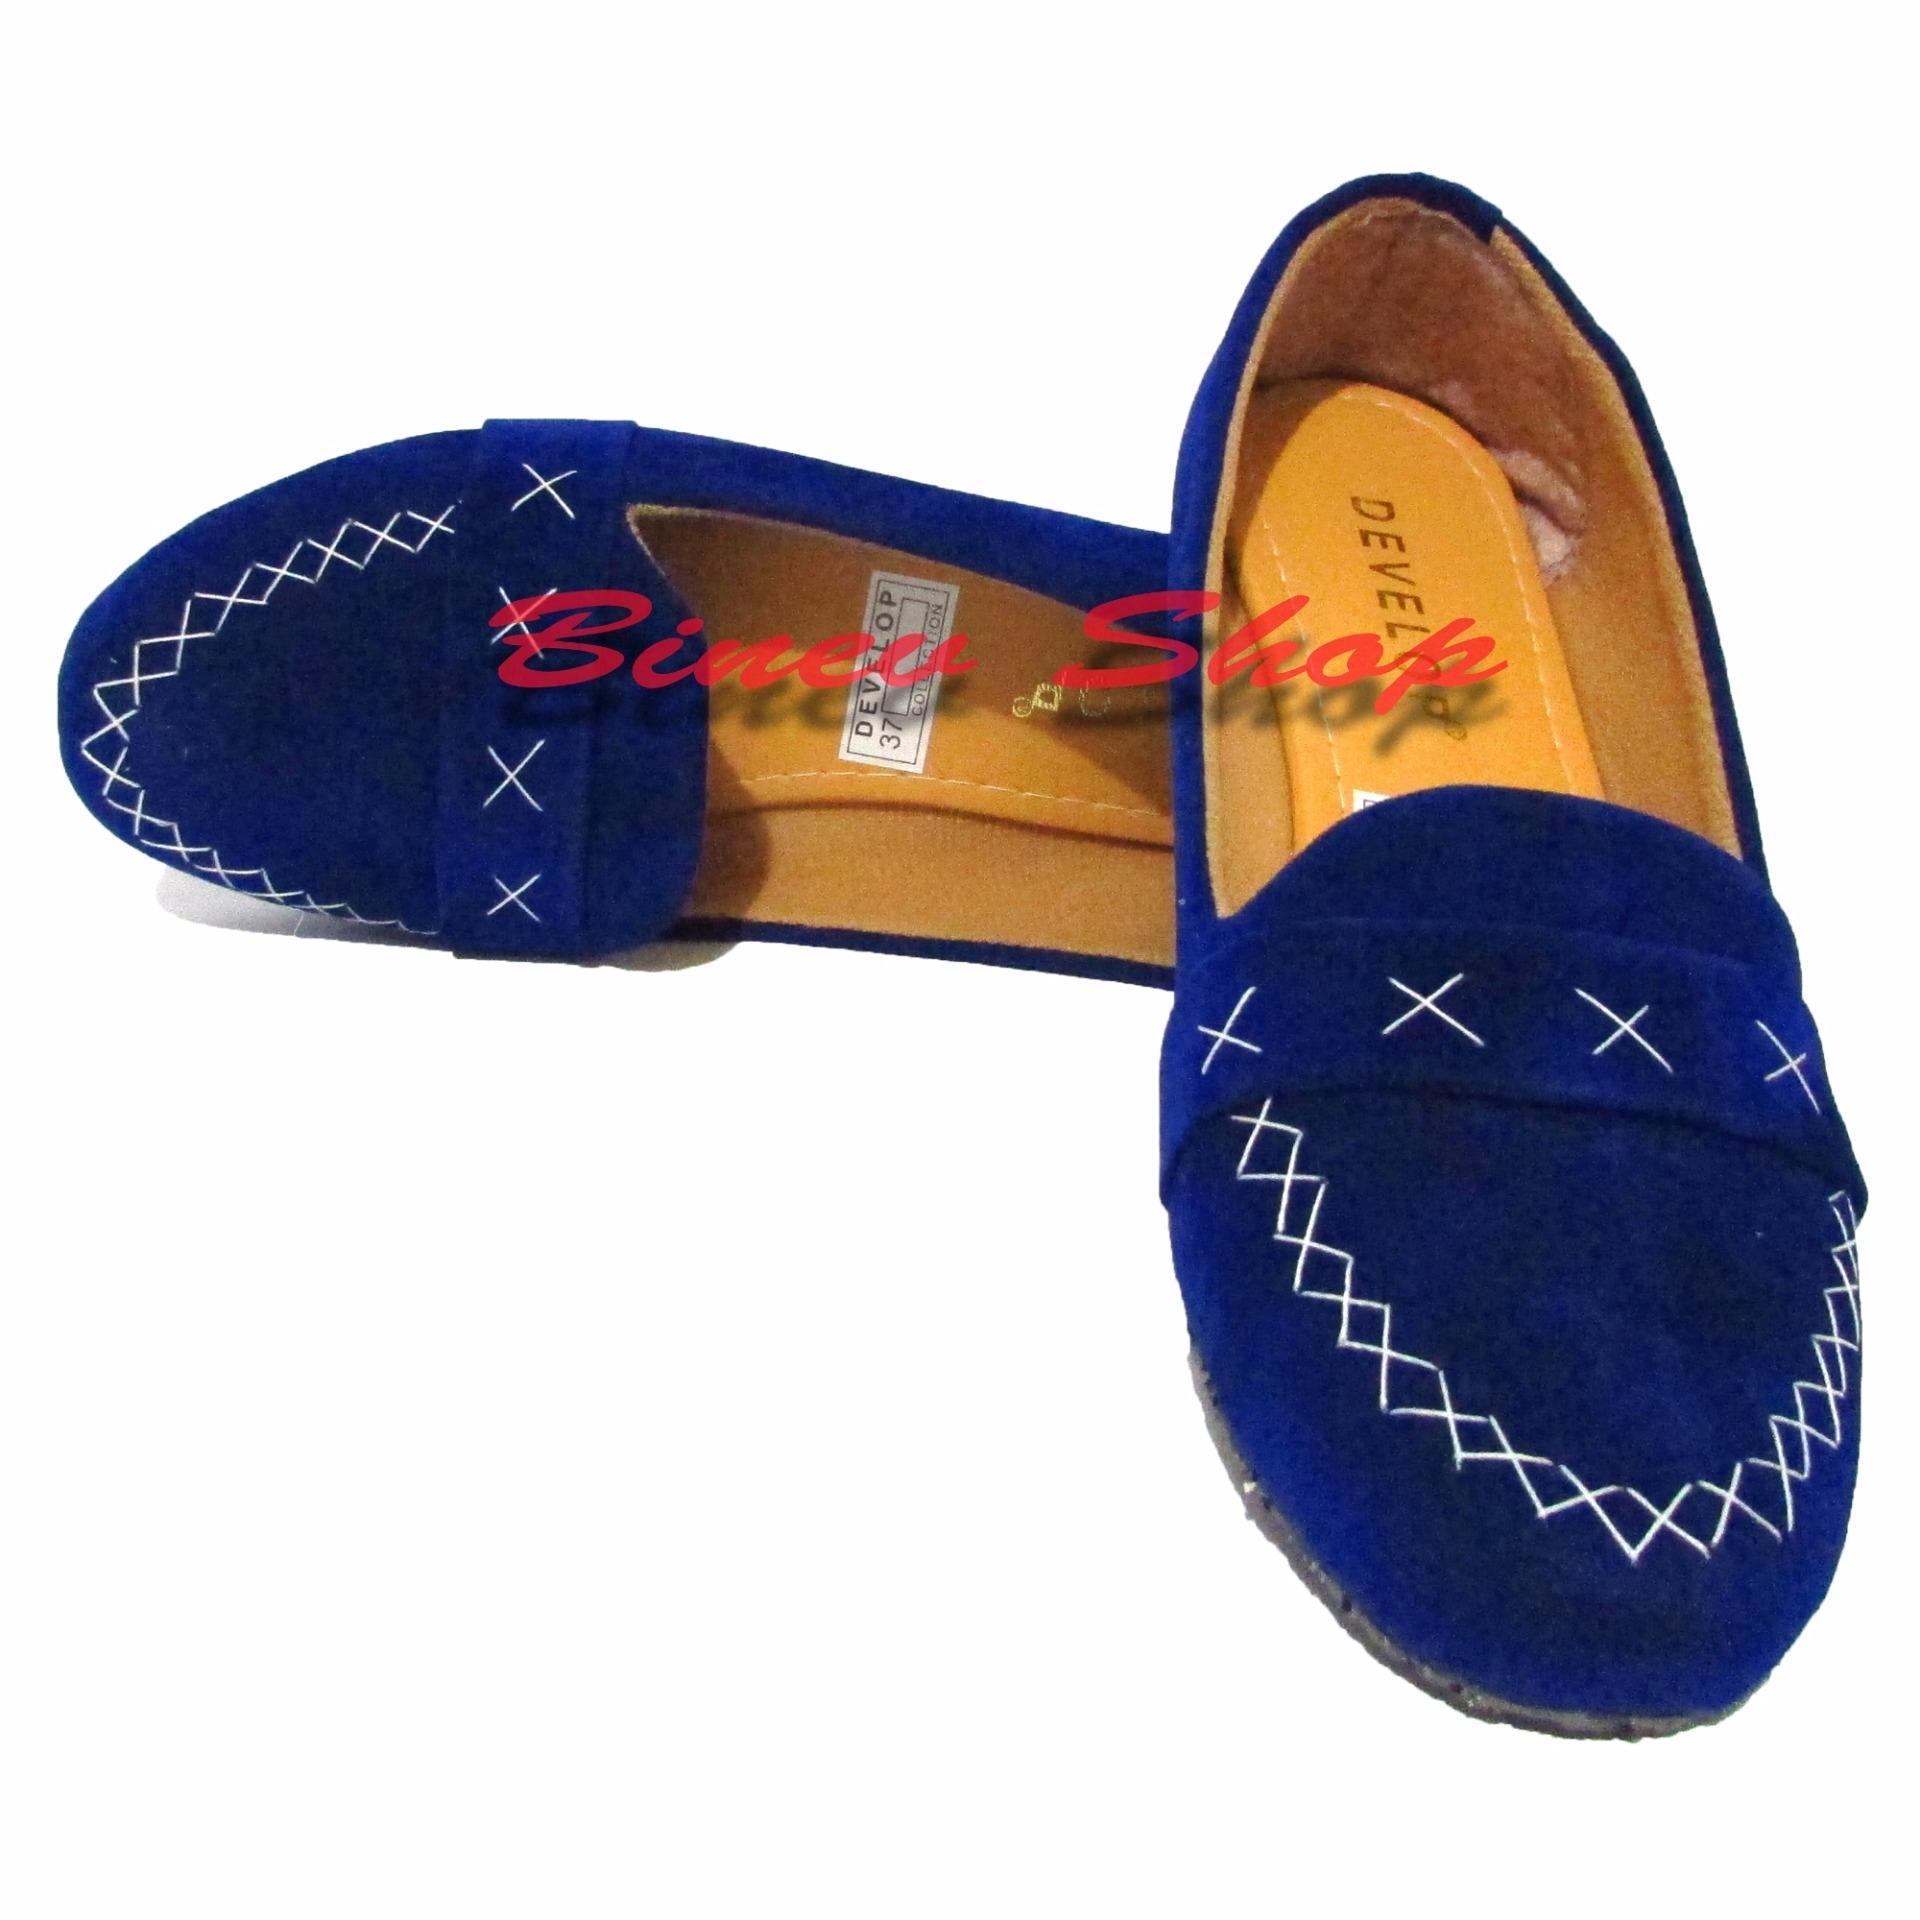 Woman Choice Flat Shoes Develop 25 Sepatu Balet Hitam. Source · San Antonio Heel,. Source · Binev Sepatu Slip On Wanita Develop 008 - Blue .